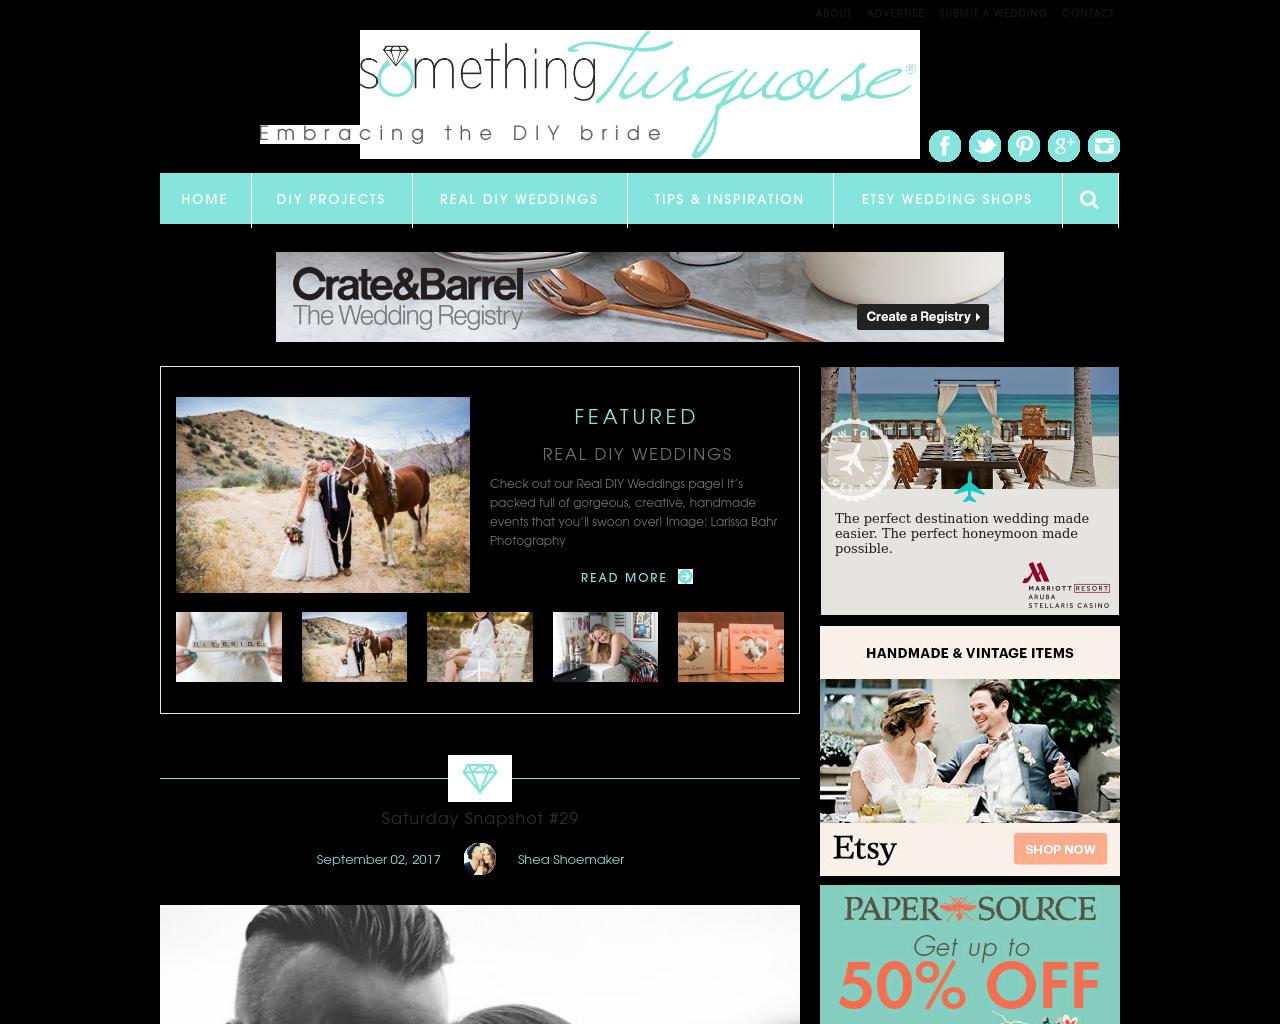 Something-Turquoise-Advertising-Reviews-Pricing